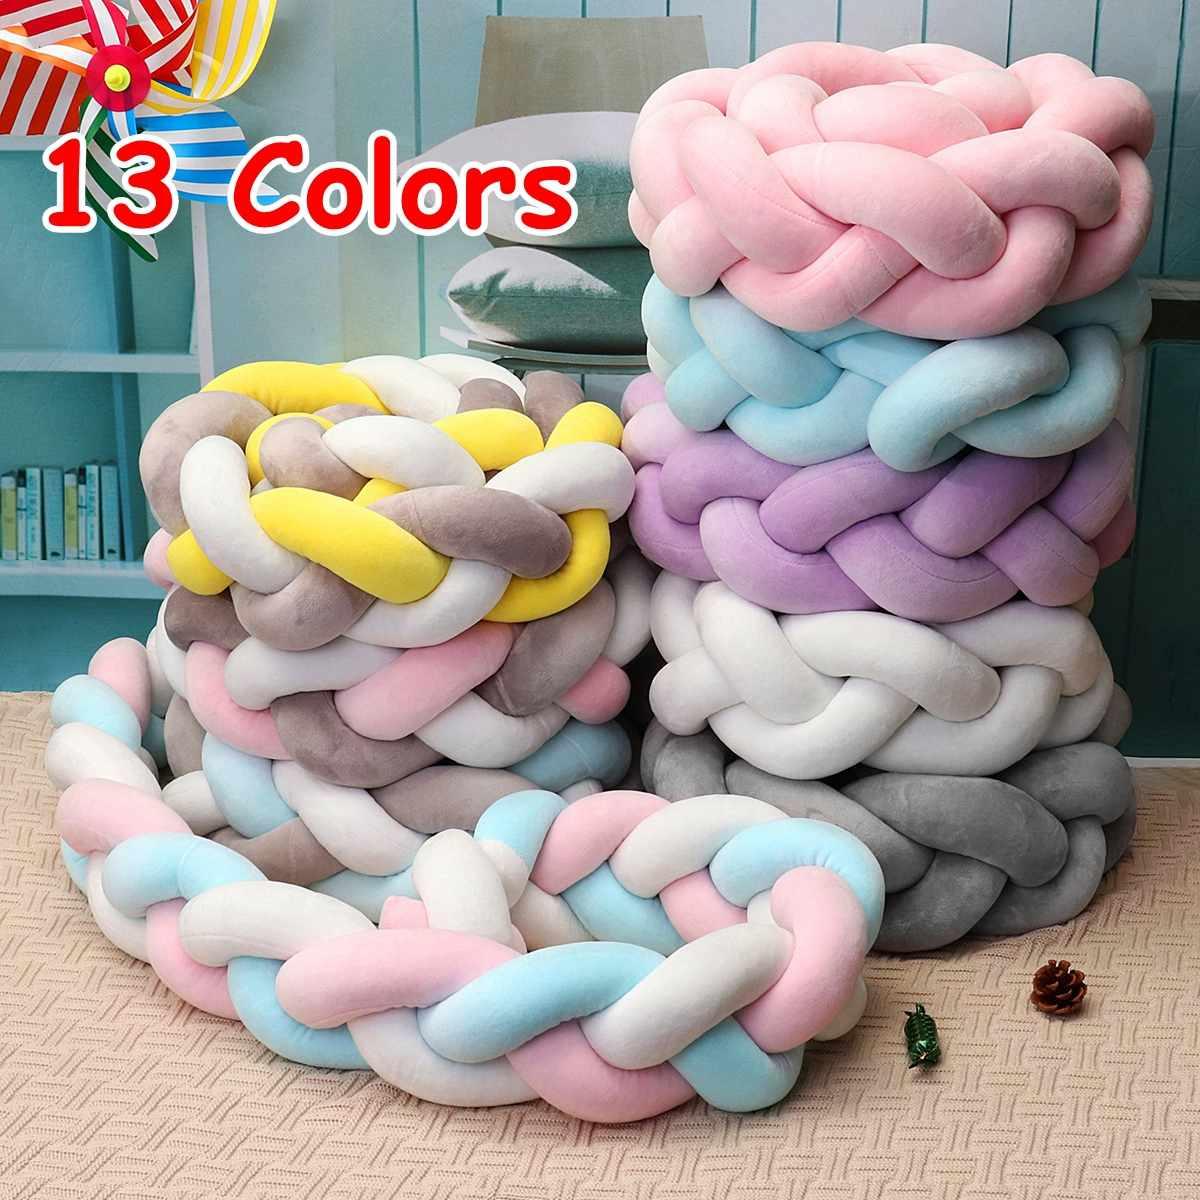 1.5m Minimalism Cotton Baby Bedding Crib Bumpers Crea.tive Braided Long Knot Ball Pillow Protector Cushion Newborns Baby